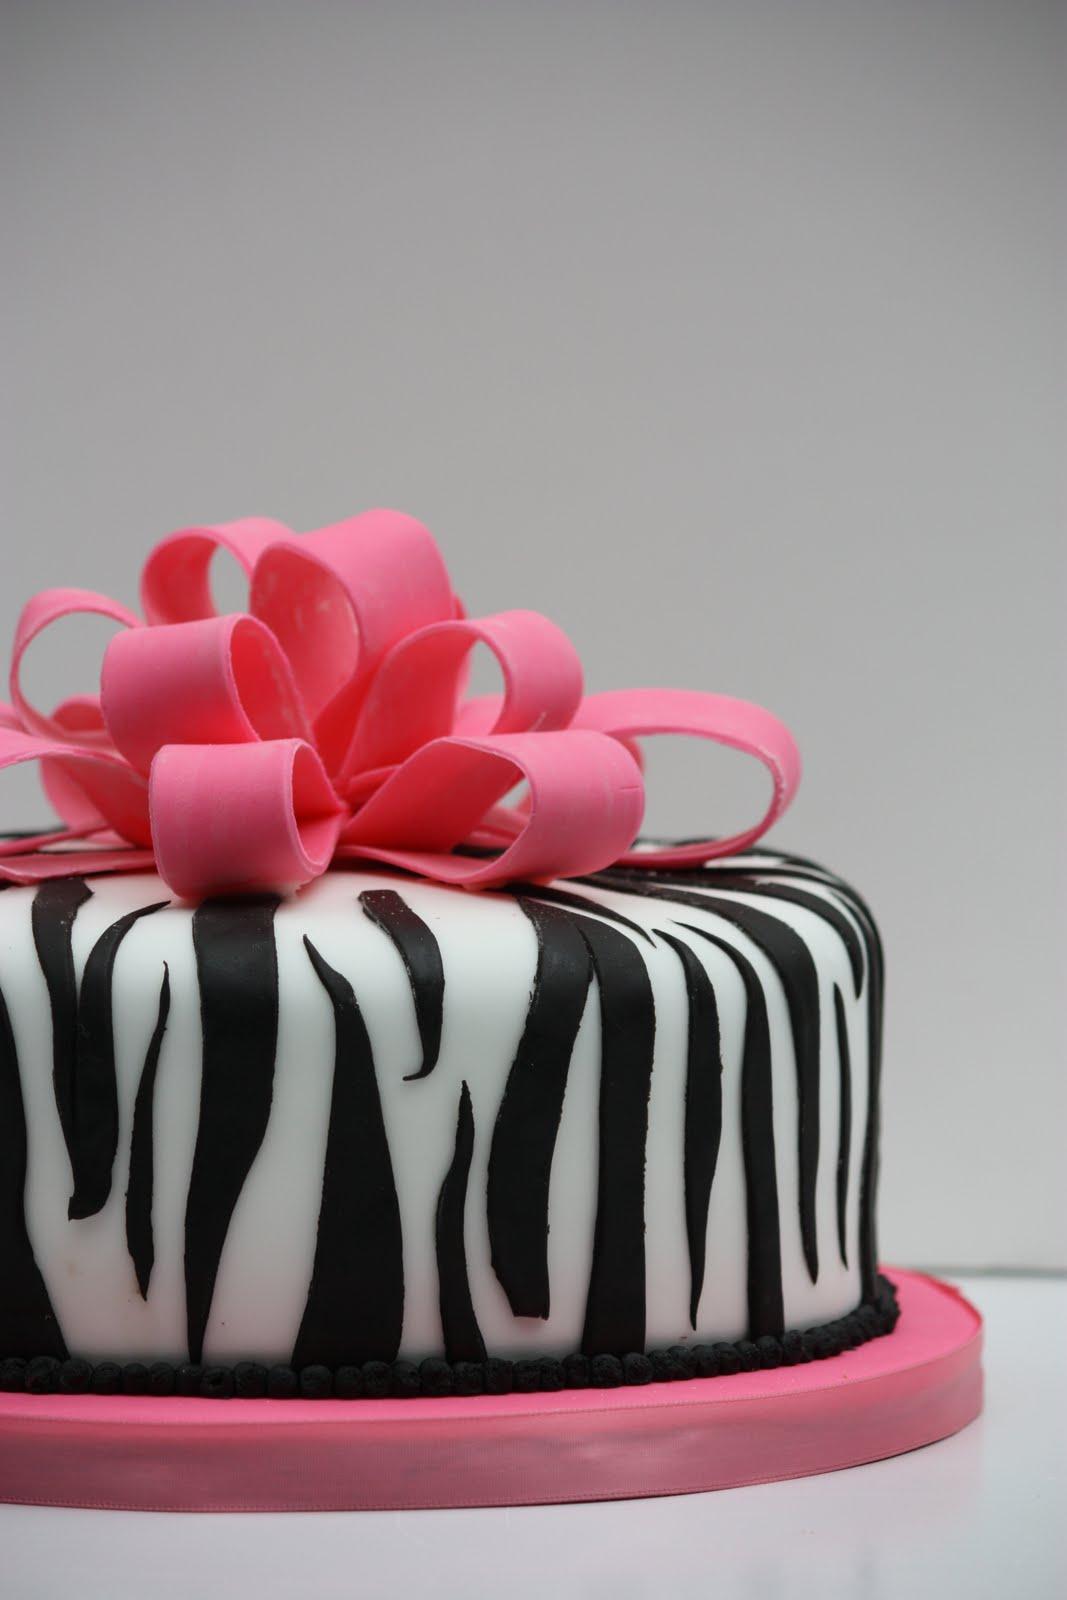 Whimsical by Design Hot Pink Bows Zebra Print Cake